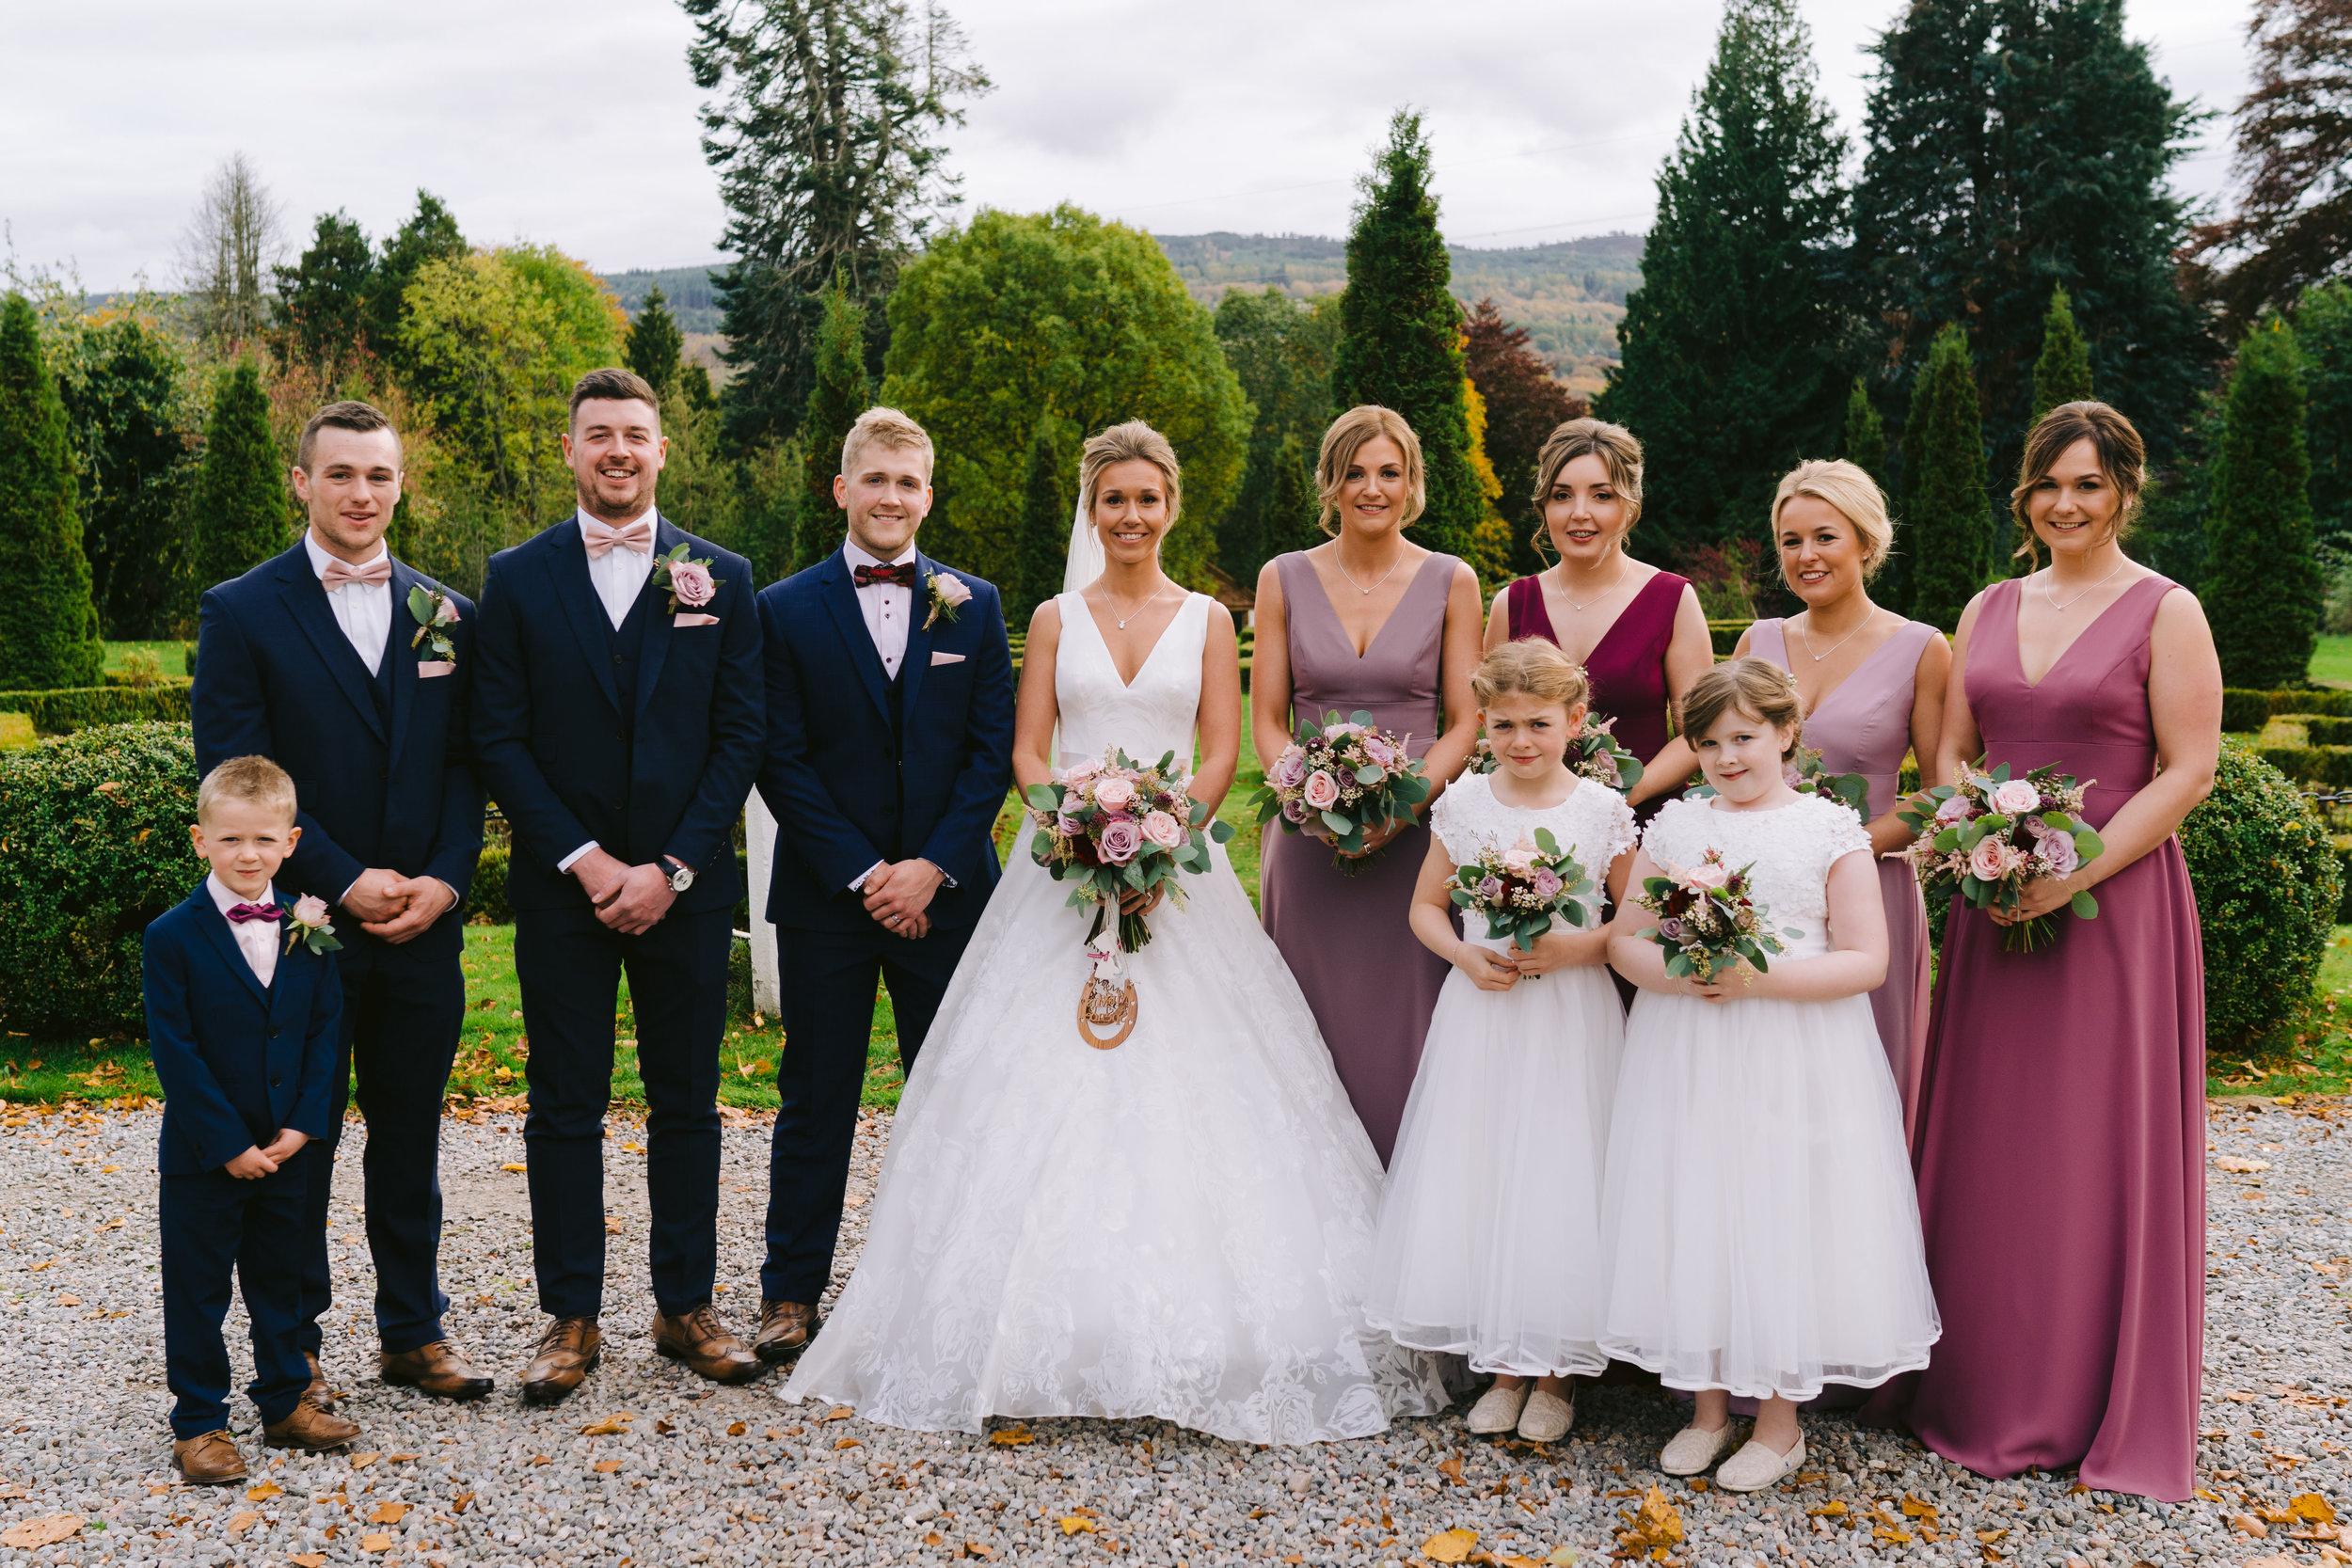 Karin_and_Shauns_Wedding_-_Achnagairn_Castle_-_www.eilidhrobertson.co.uk-656.jpg